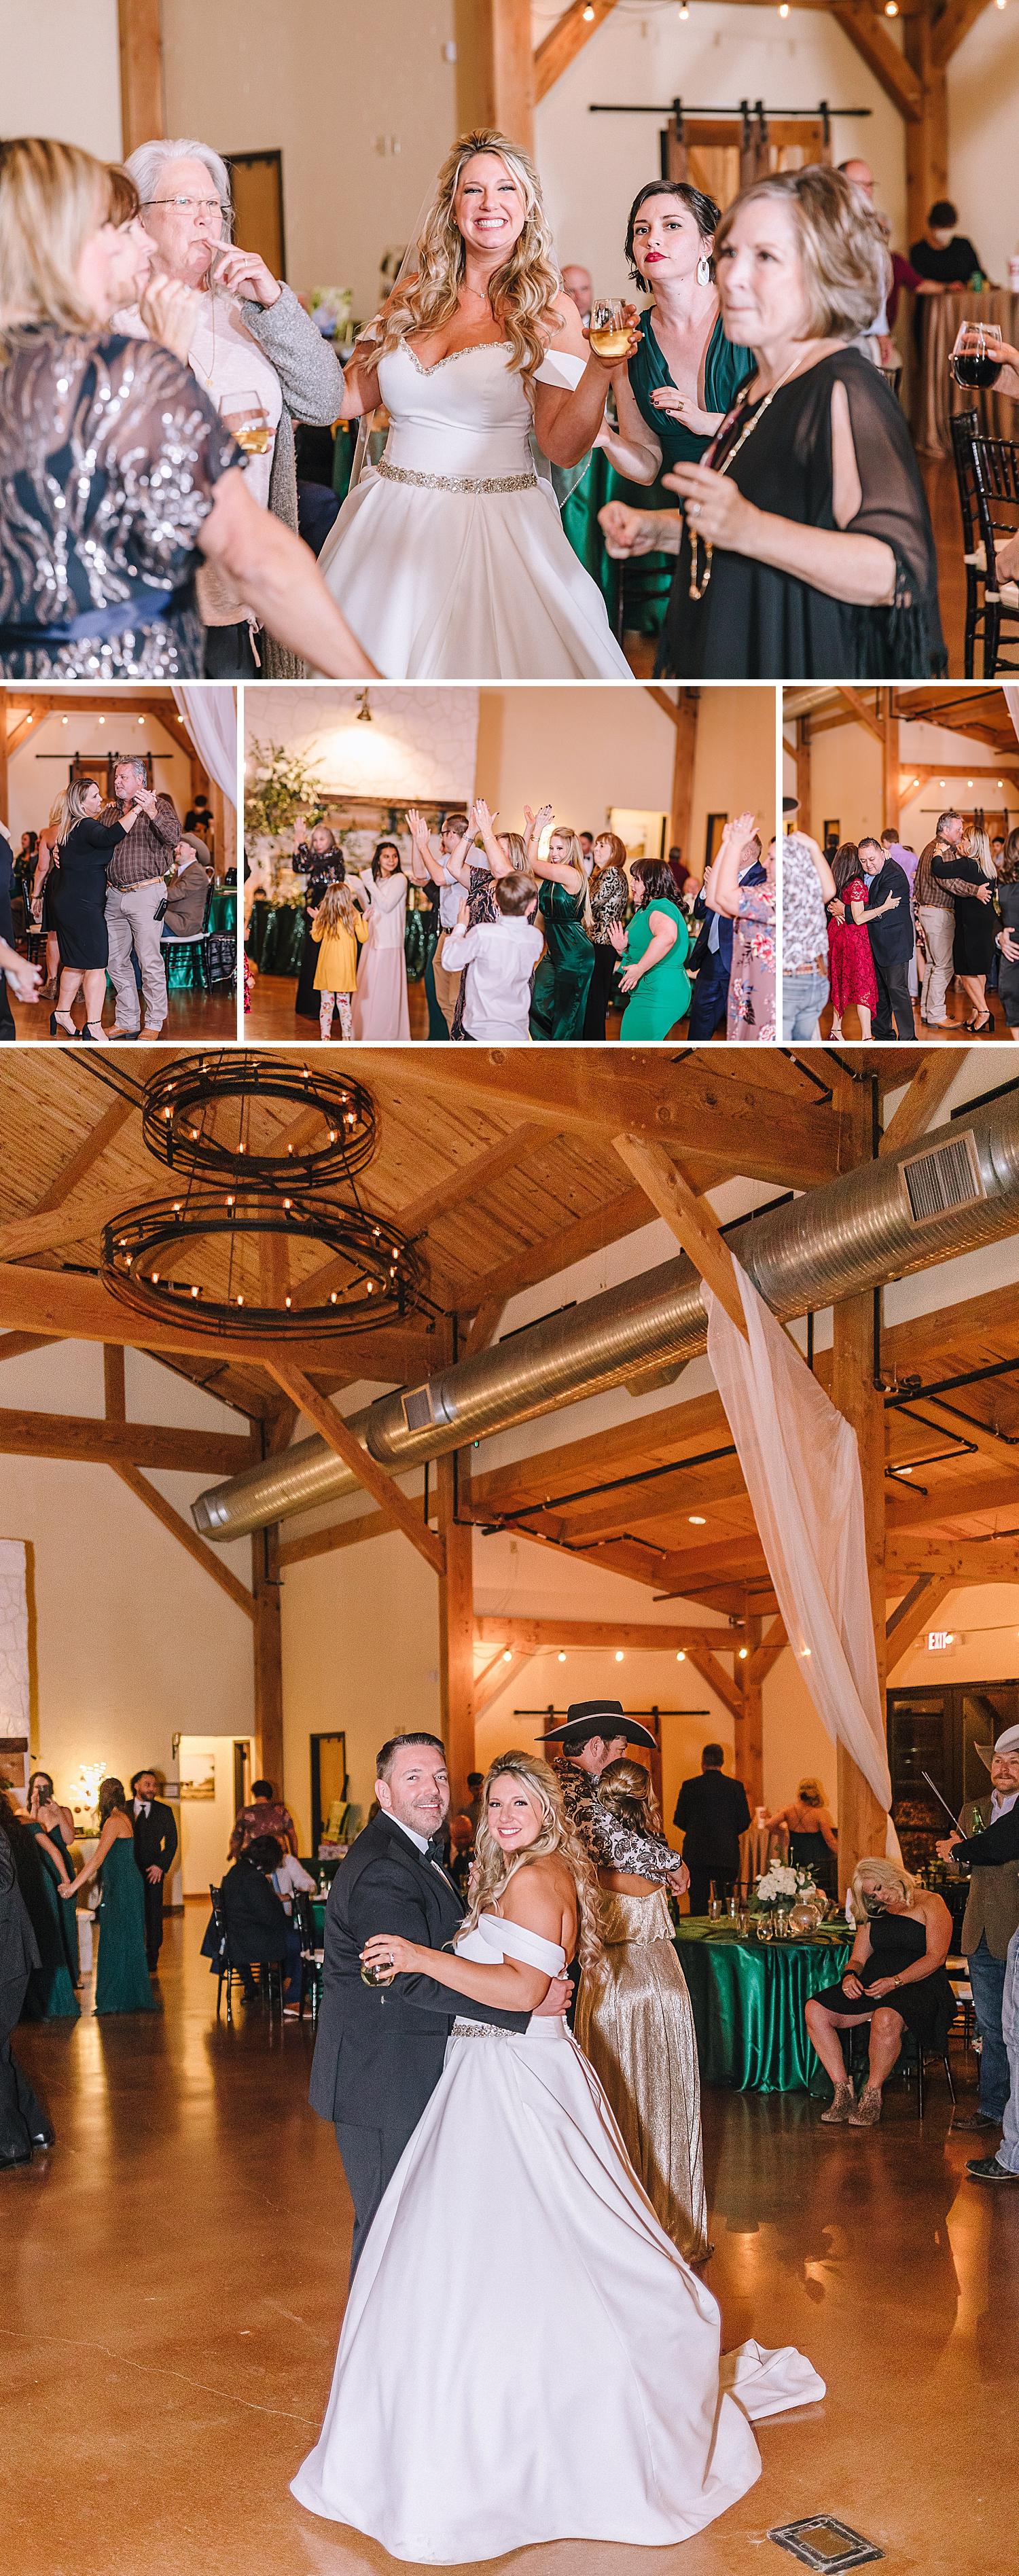 Magnolia-Halle-Wedding-San-Antonio-Texas-Bride-Grom_0109.jpg